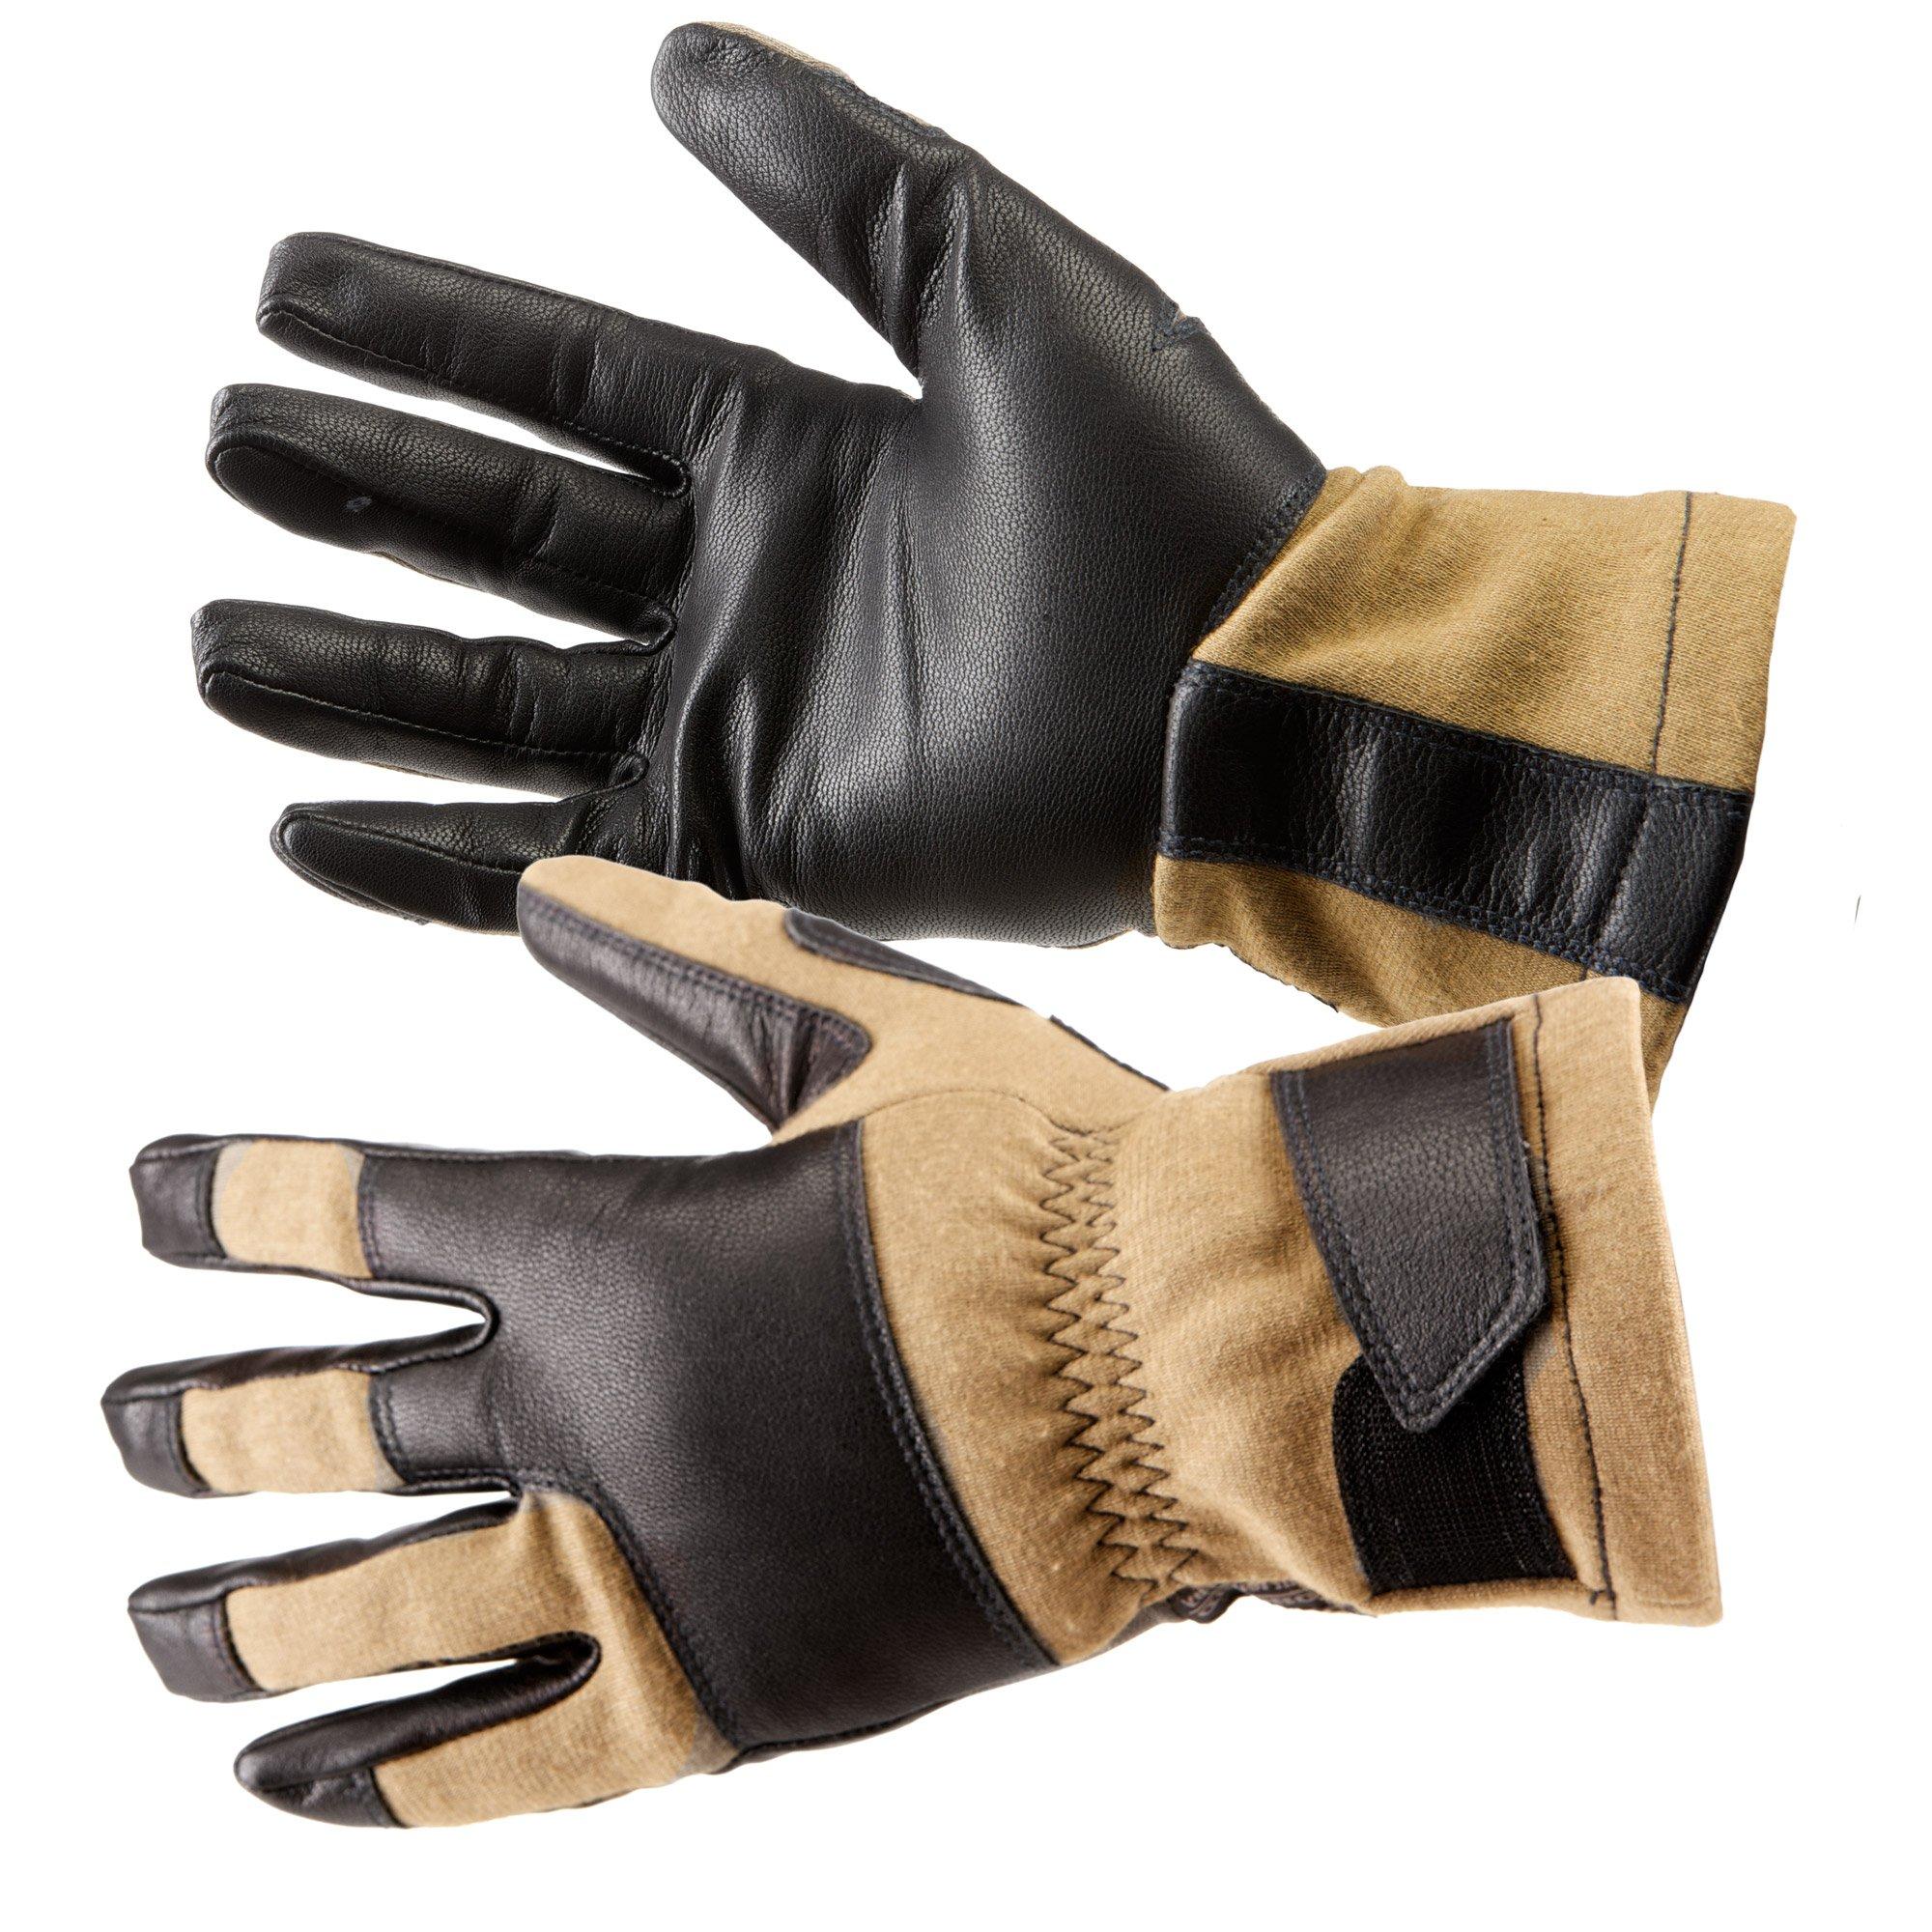 5.11 Tactical 59361 Tac NFOE2 Flight Glove, Tan, Medium